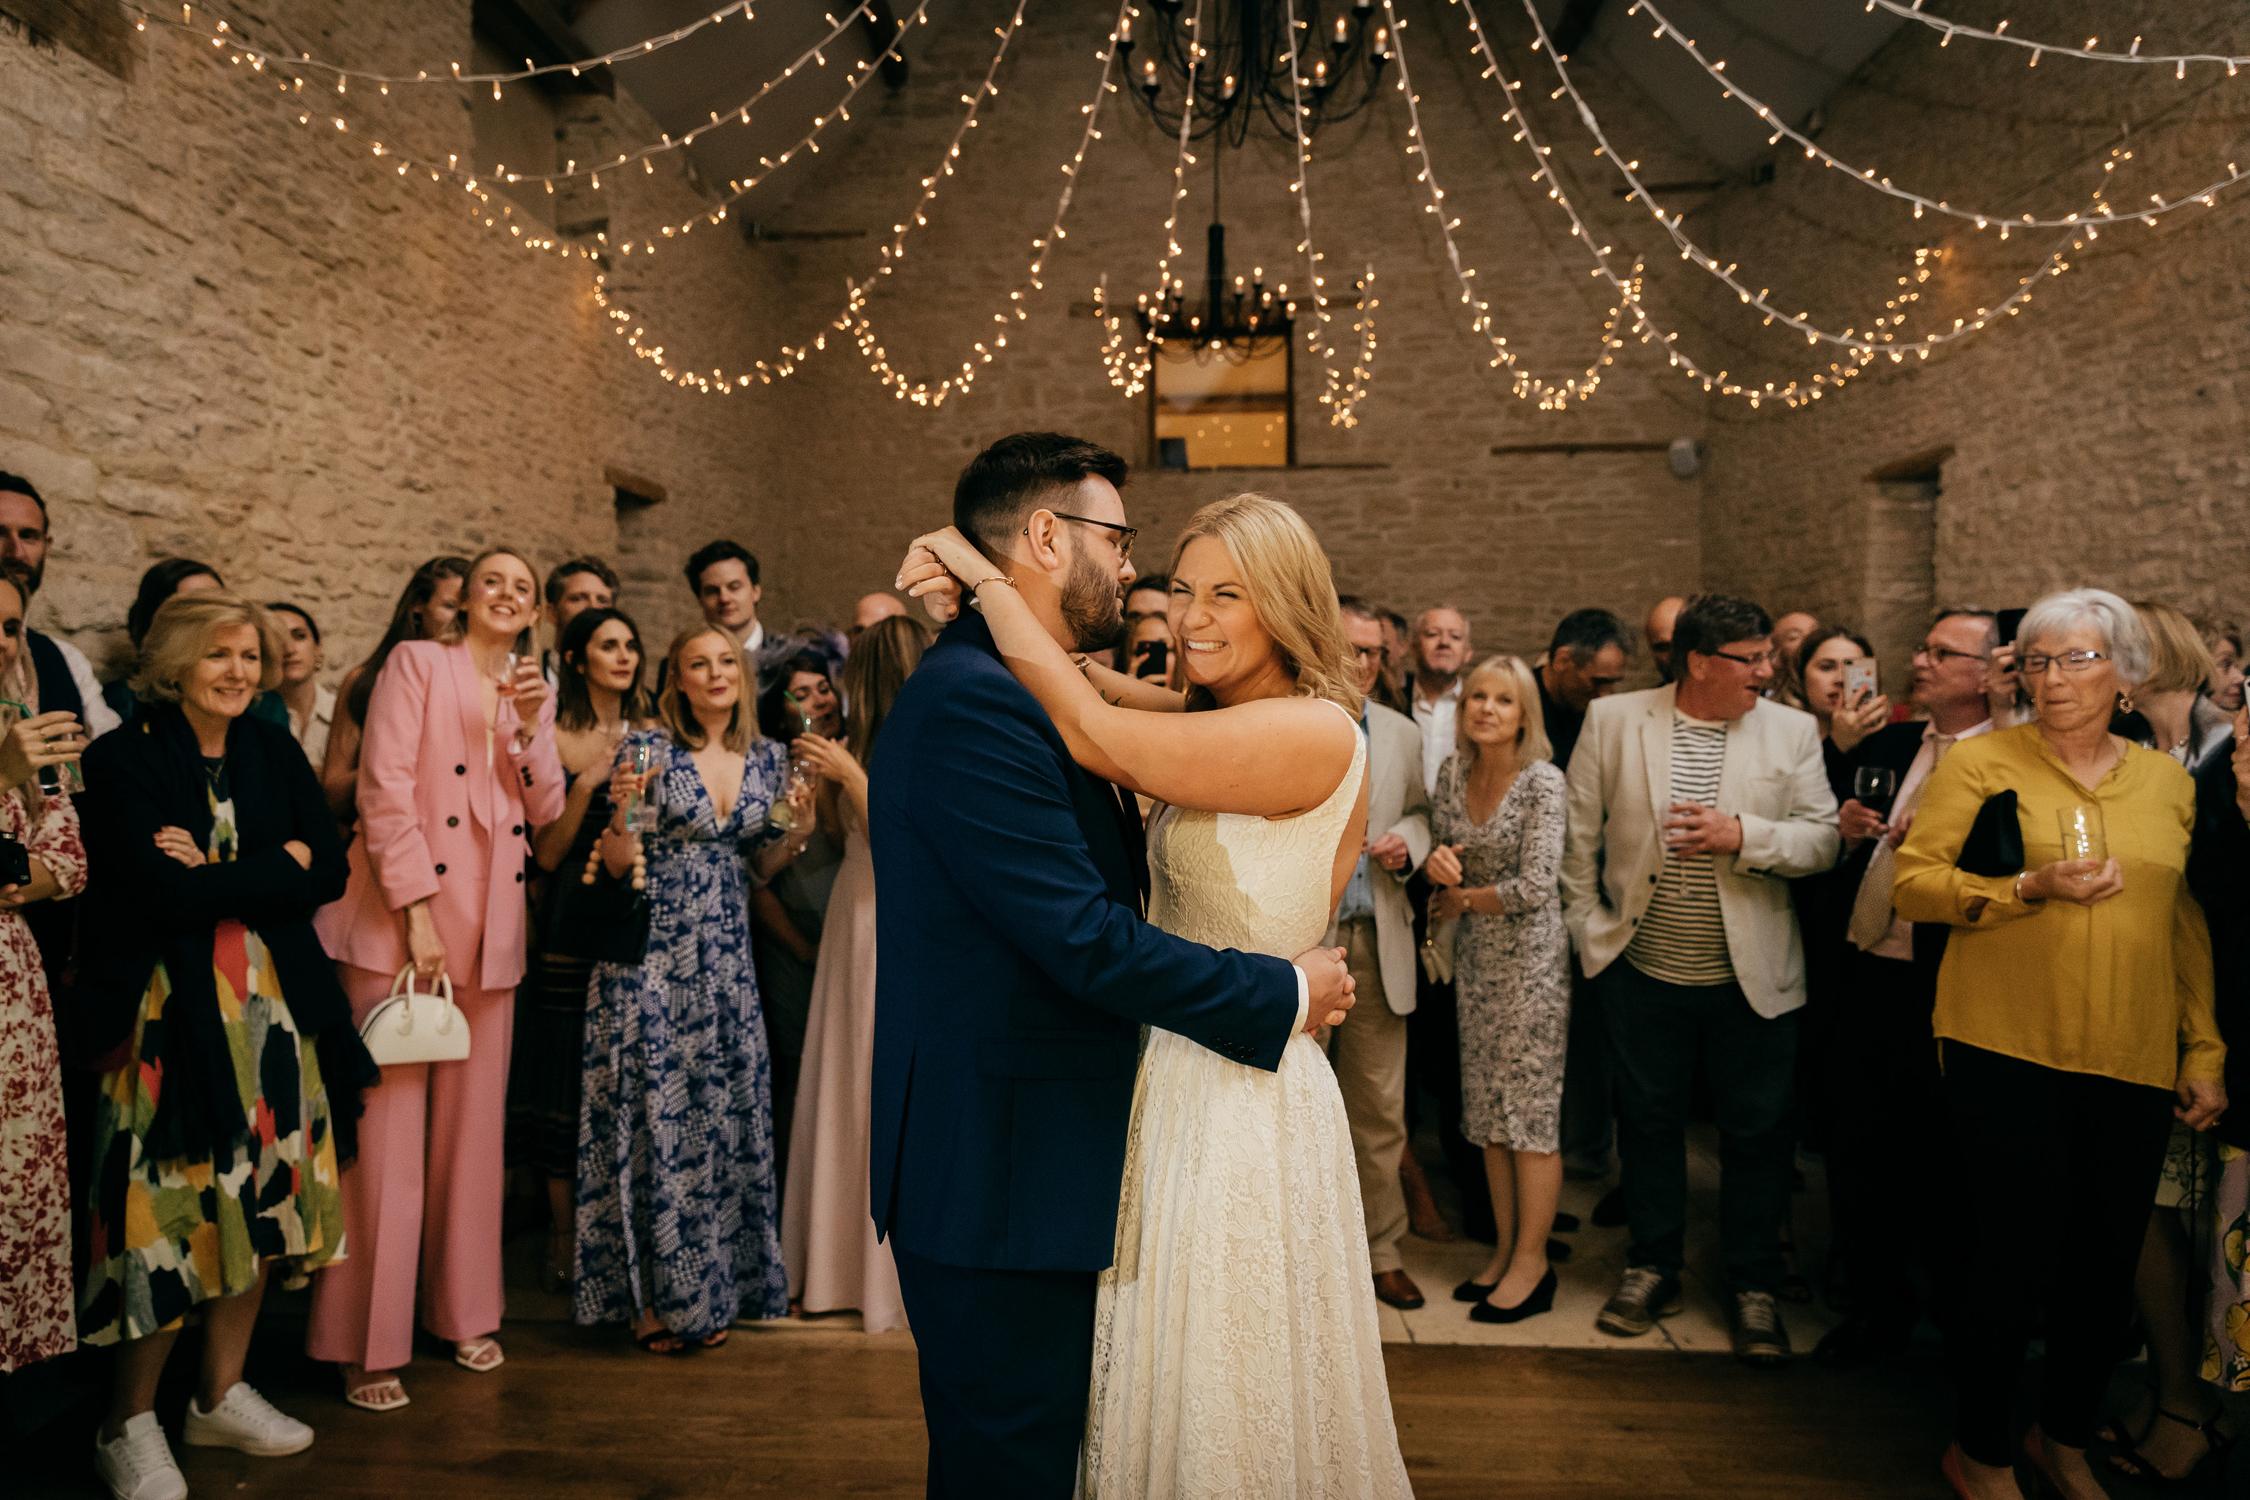 documentary wedding photo of the first dance at kingscote barn wedding